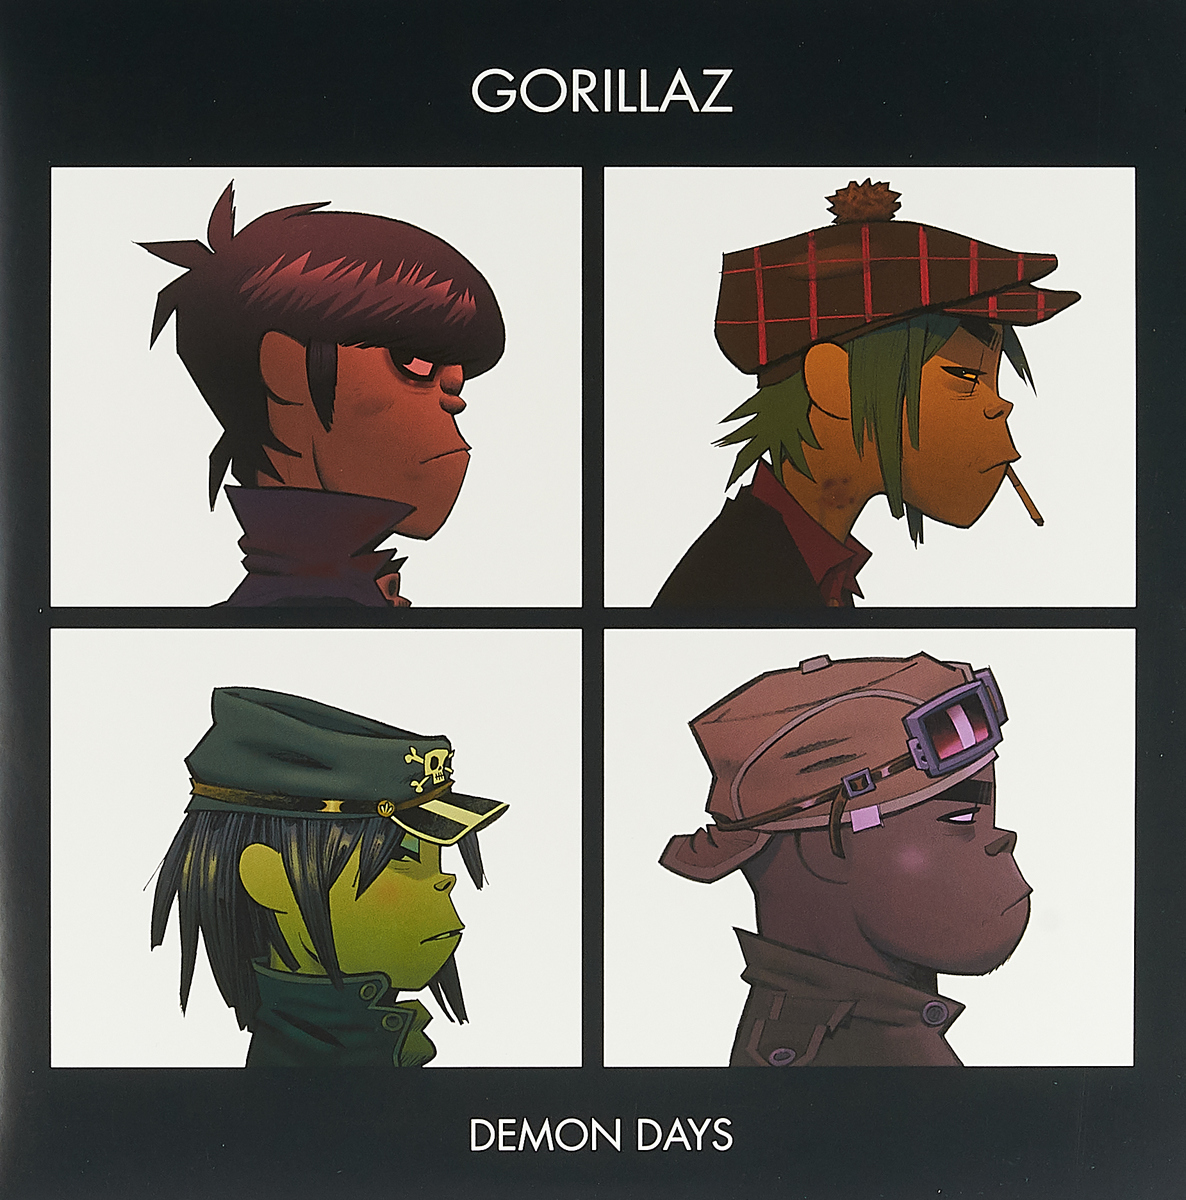 Gorillaz Gorillaz. Demon Days (2 LP) 2 days pass openair st gallen